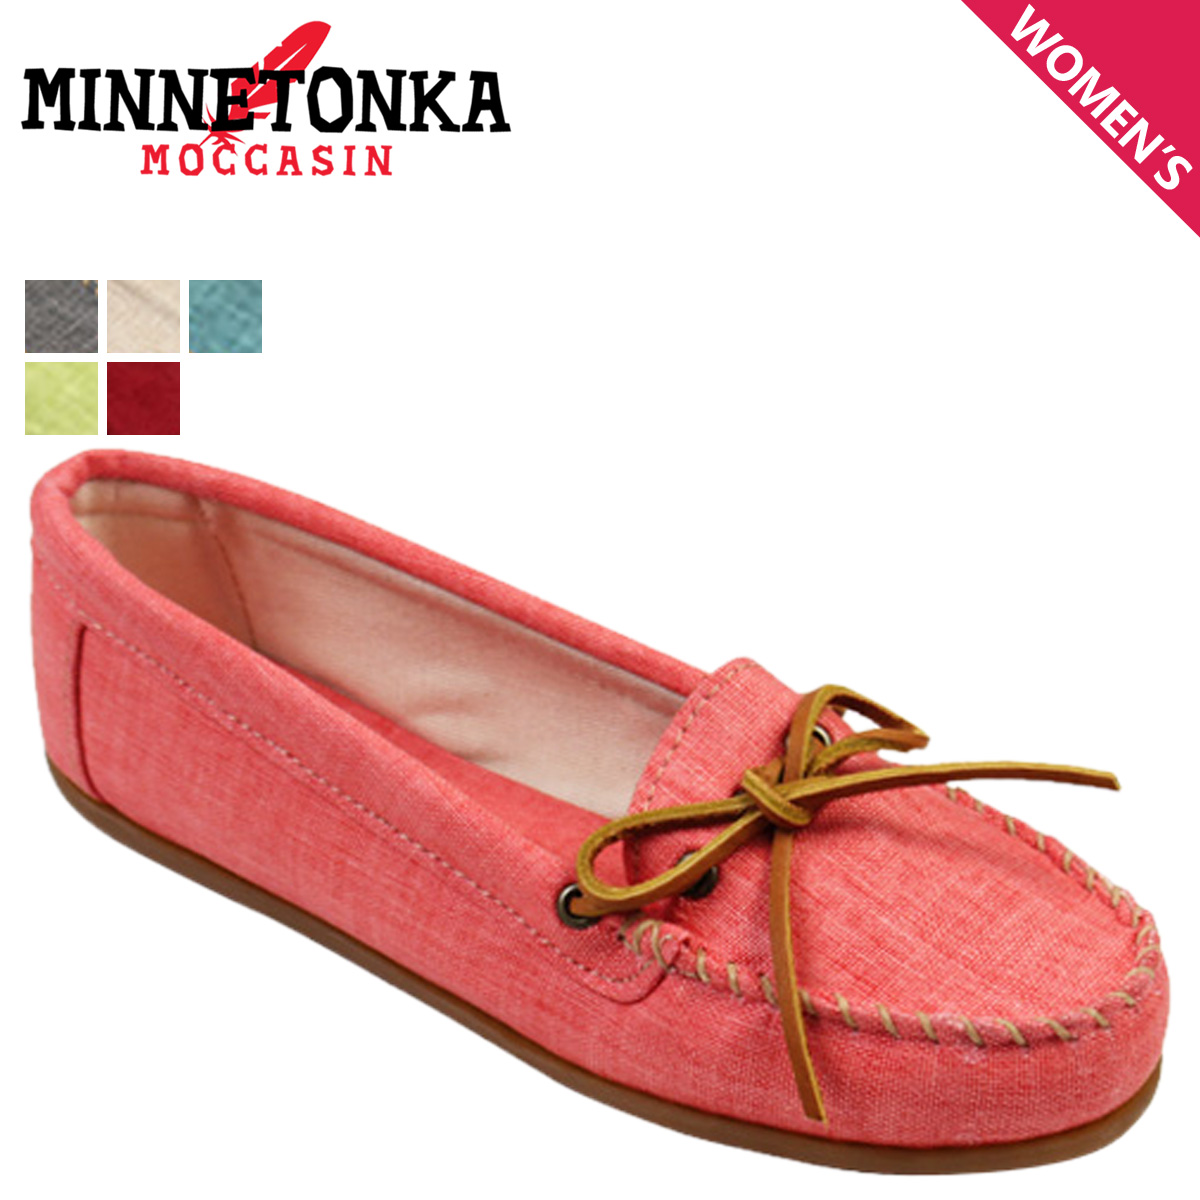 038b49c38e0 SneaK Online Shop: Mine Tonka MINNETONKA moccasins canvas mock ...